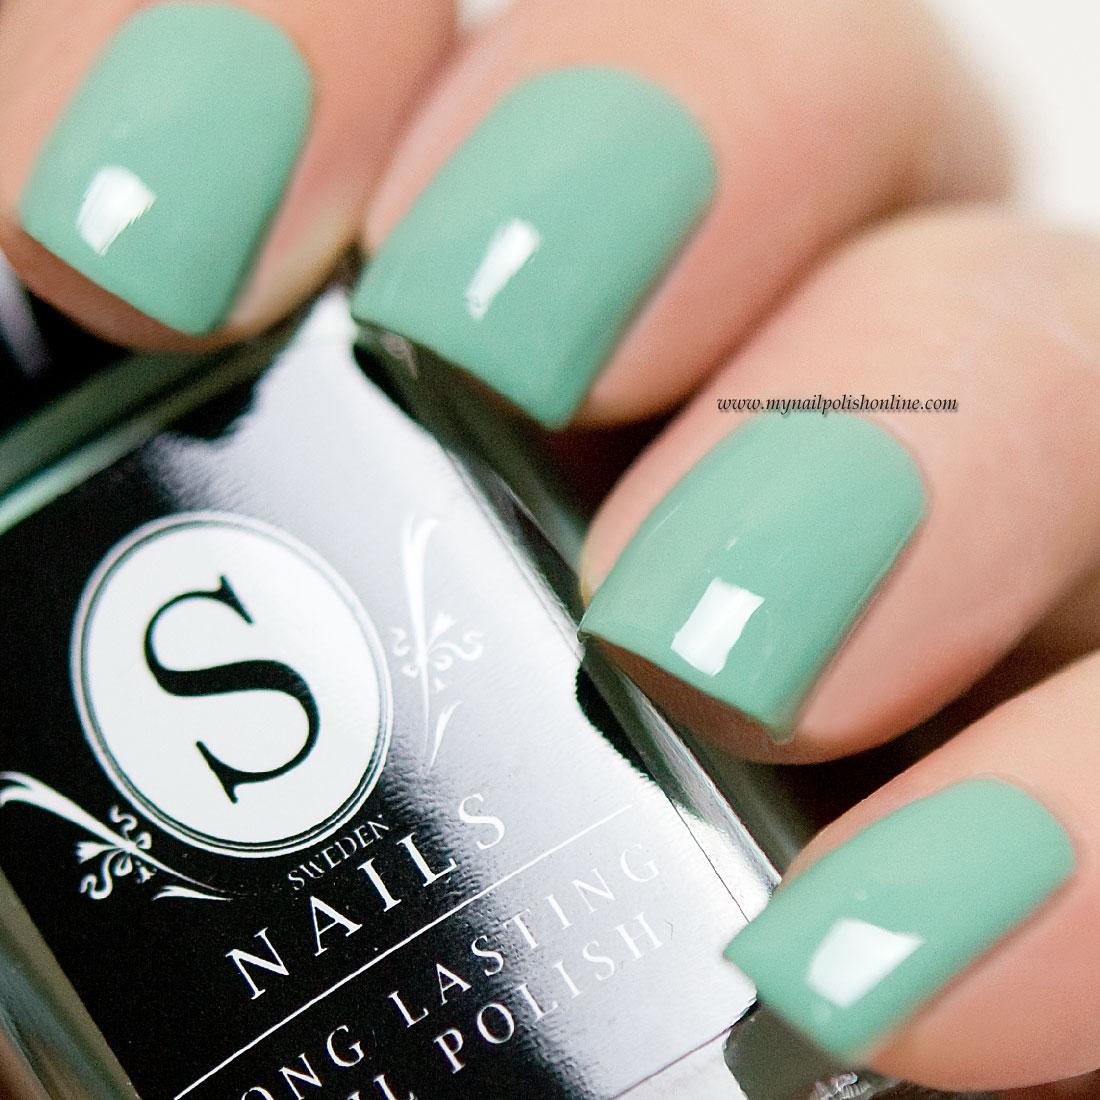 Sweden Nails – Green Tea | | My Nail Polish Online